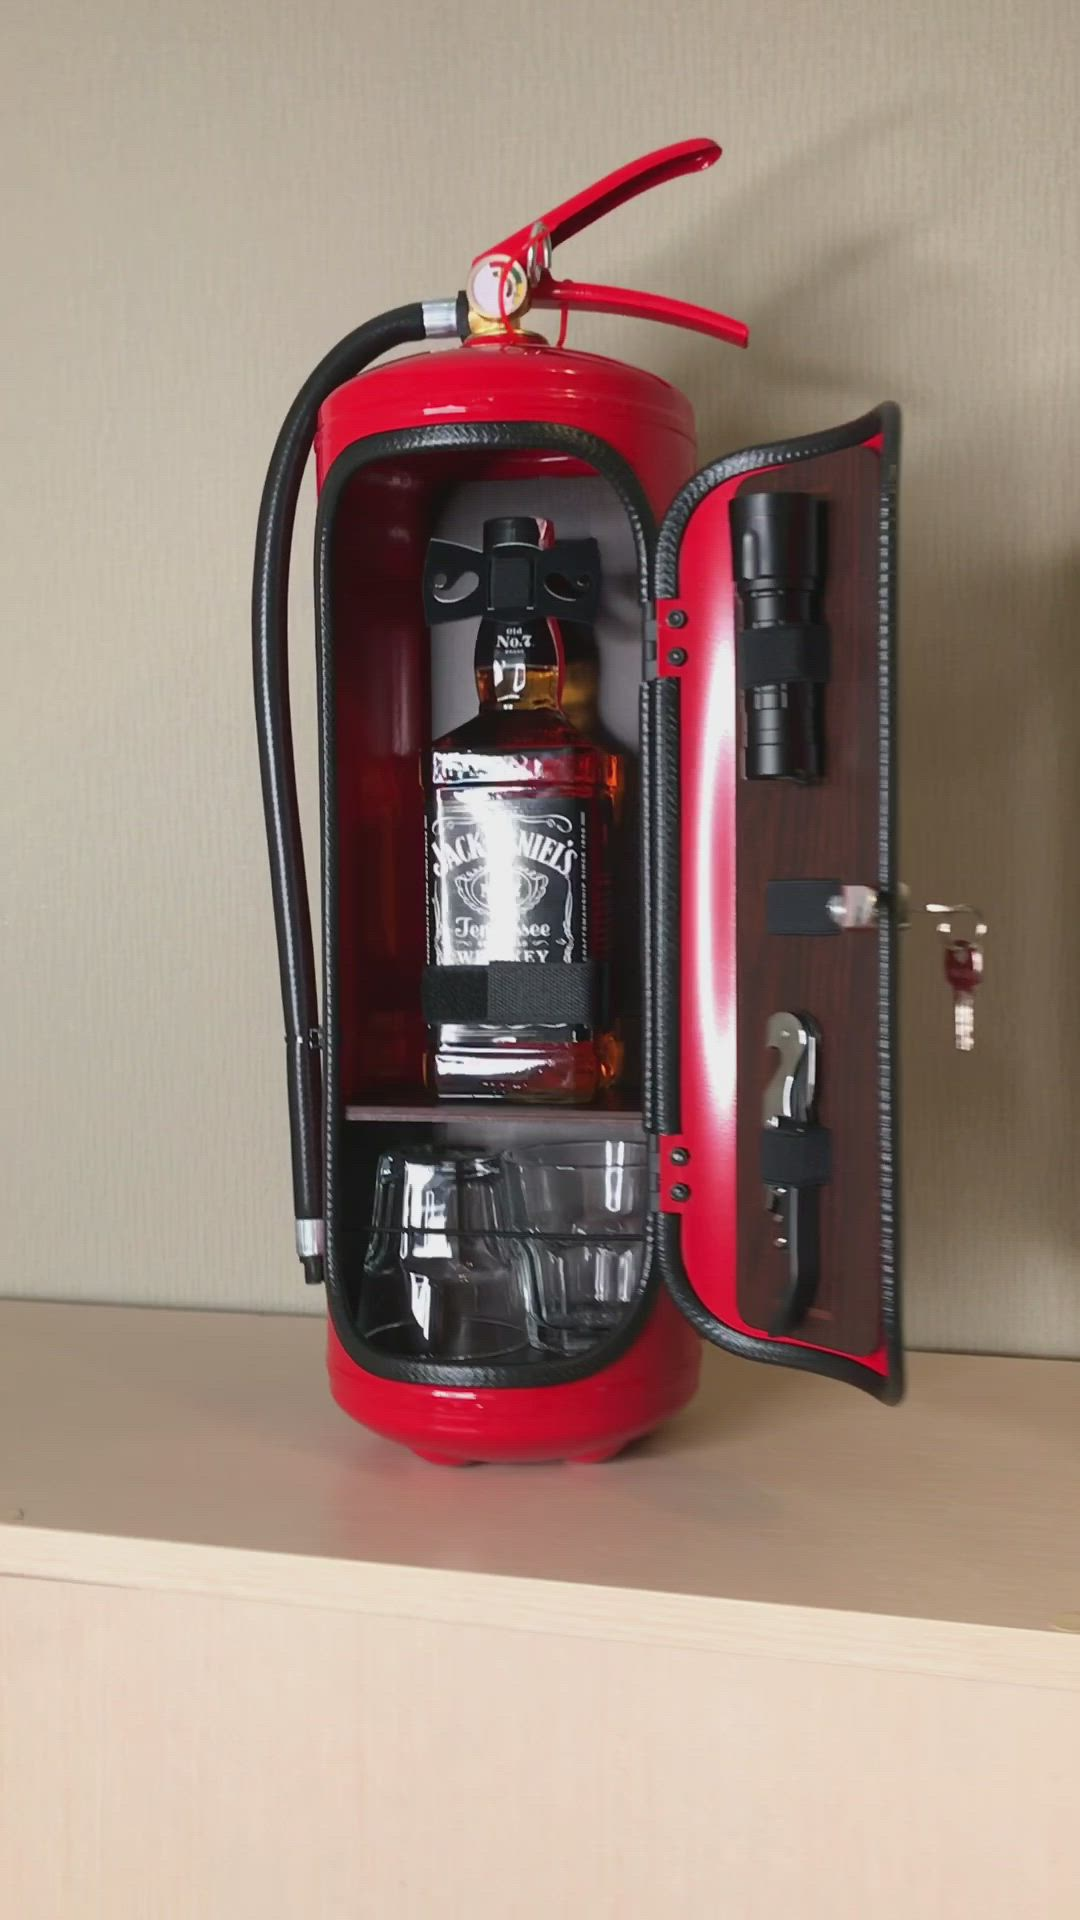 Fire Extinguisher Mini Bar Fireman Gift Firefighter Gift Video Video In 2020 Fire Extinguisher Firemen Gifts Mini Bar